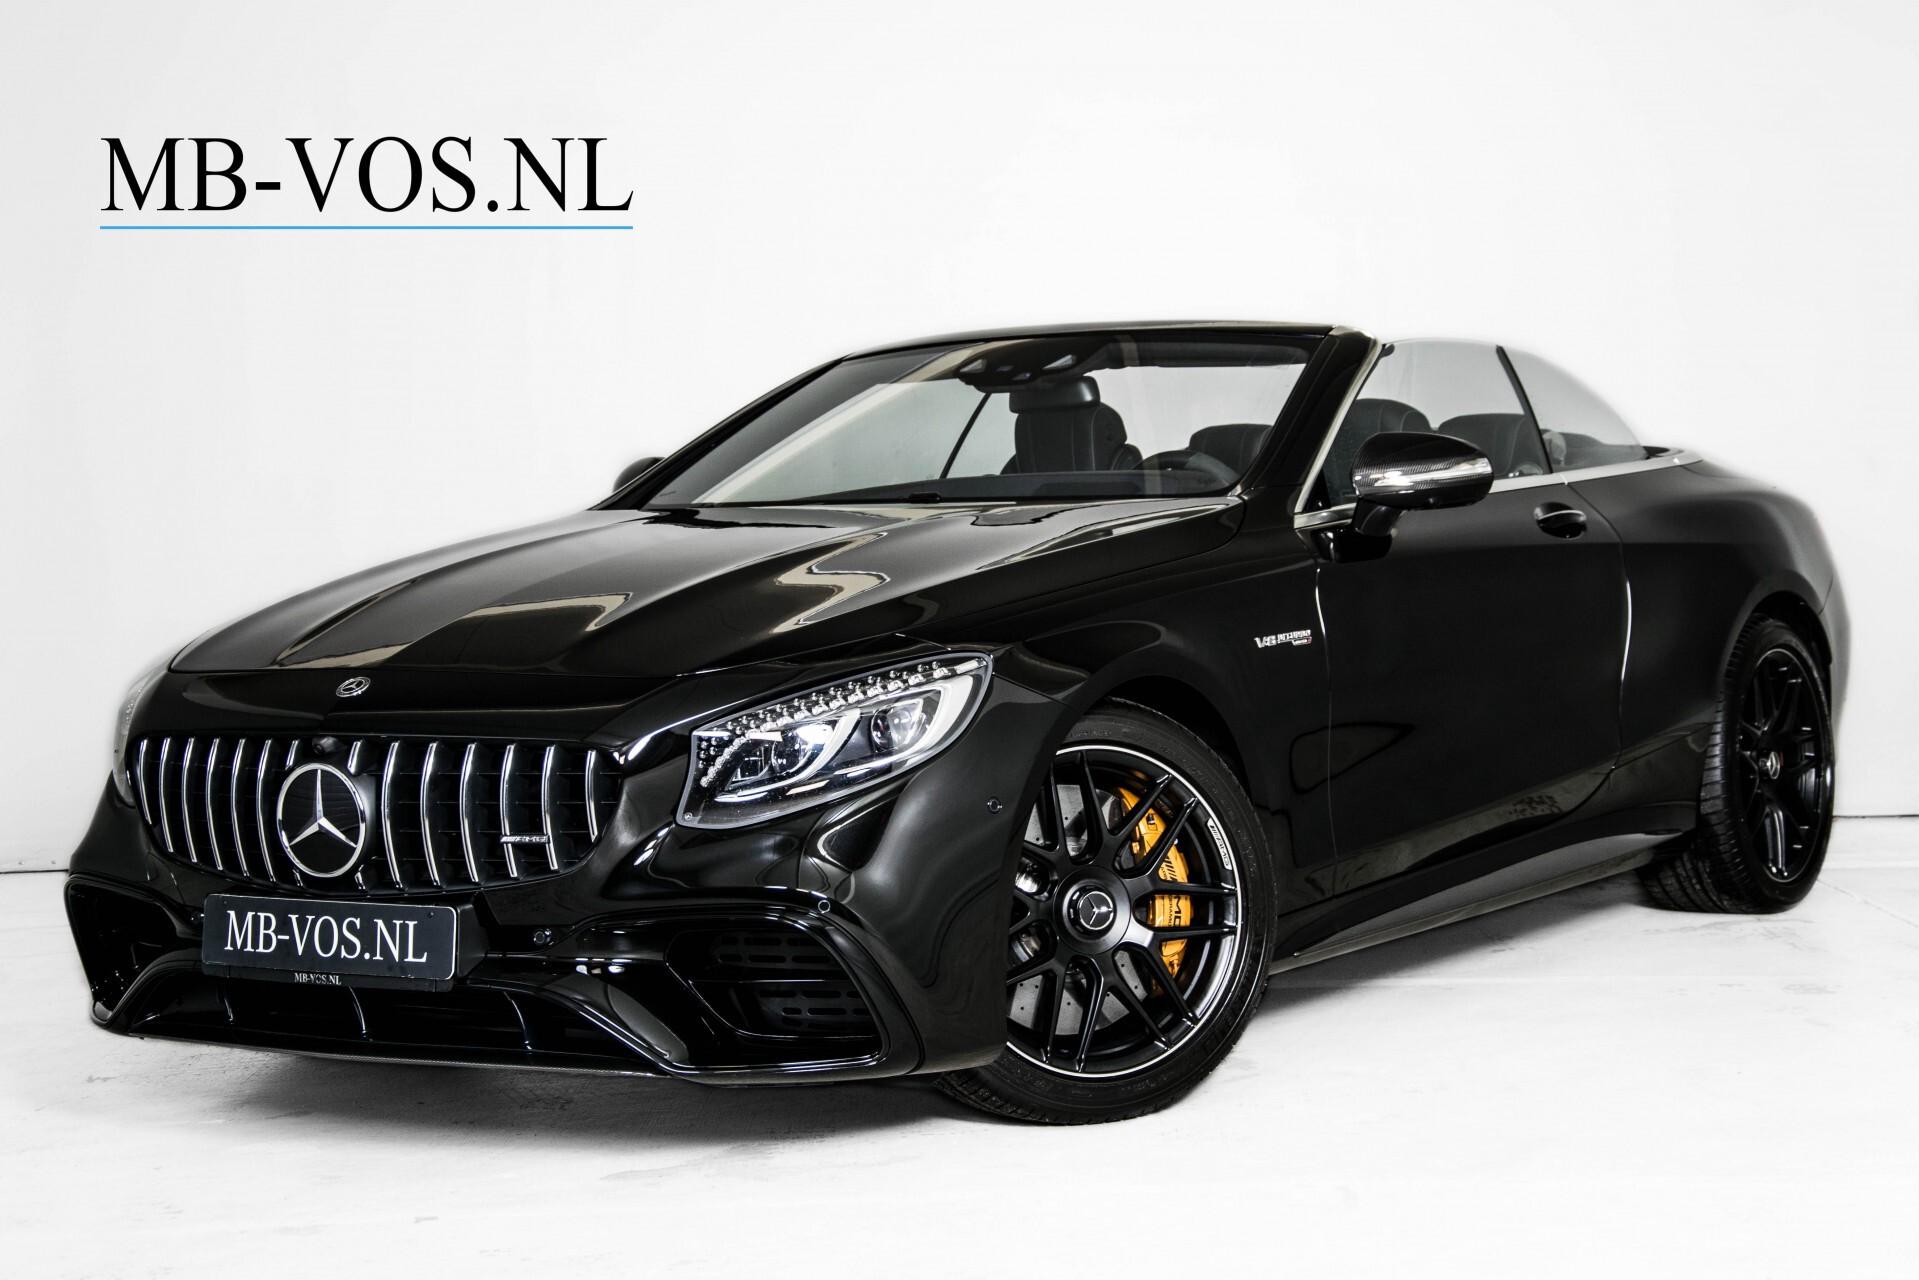 Mercedes-Benz S-Klasse Cabrio 63 AMG 4-M Ceramic/Designo/Carbon/Burmester High End Aut Foto 1